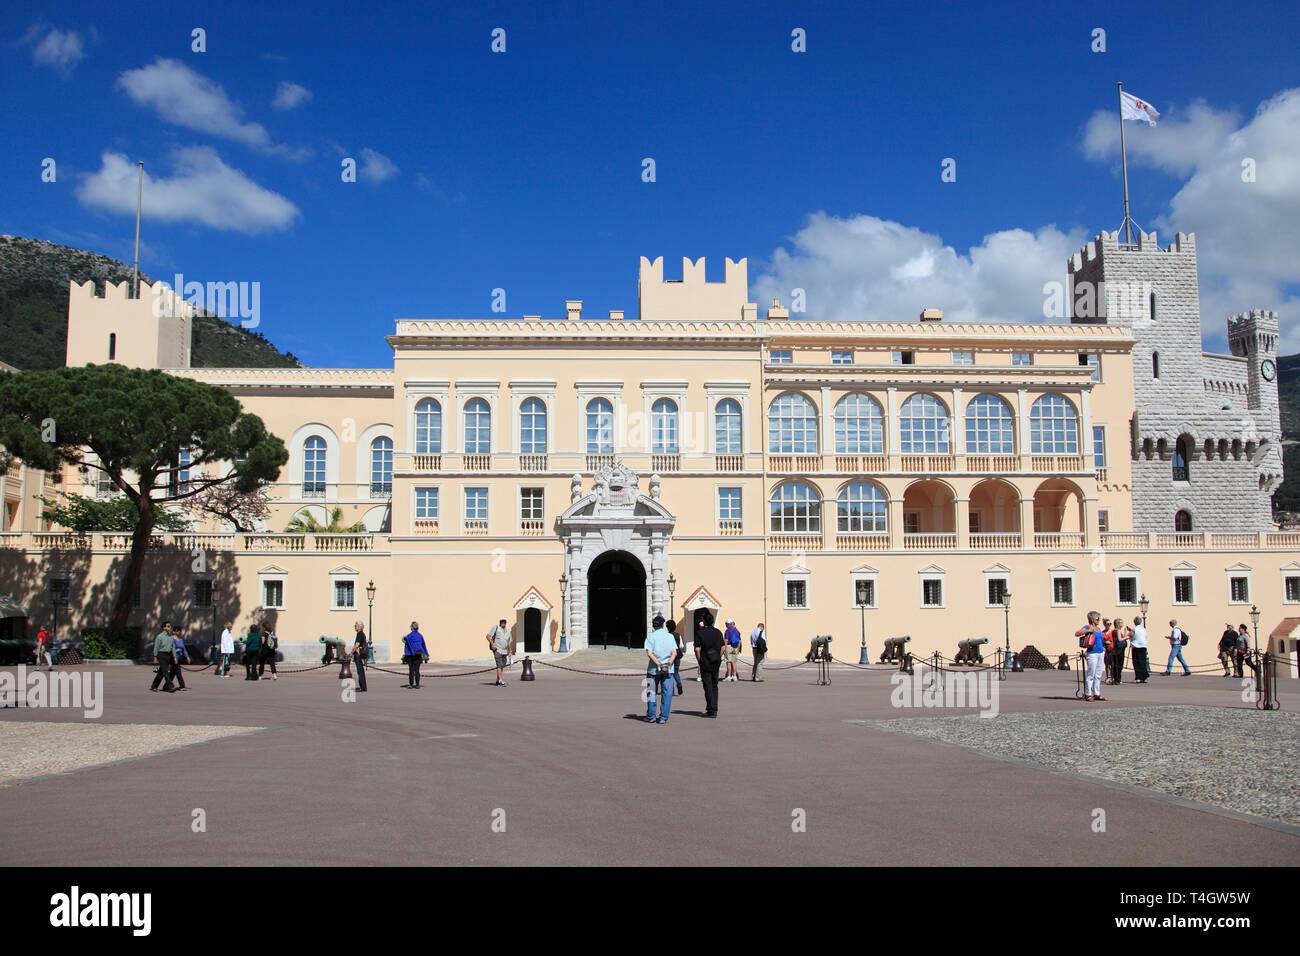 Princes of Grimaldi Palace, Royal Palace, Monaco, Cote d Azur, Mediterranean, Europe - Stock Image